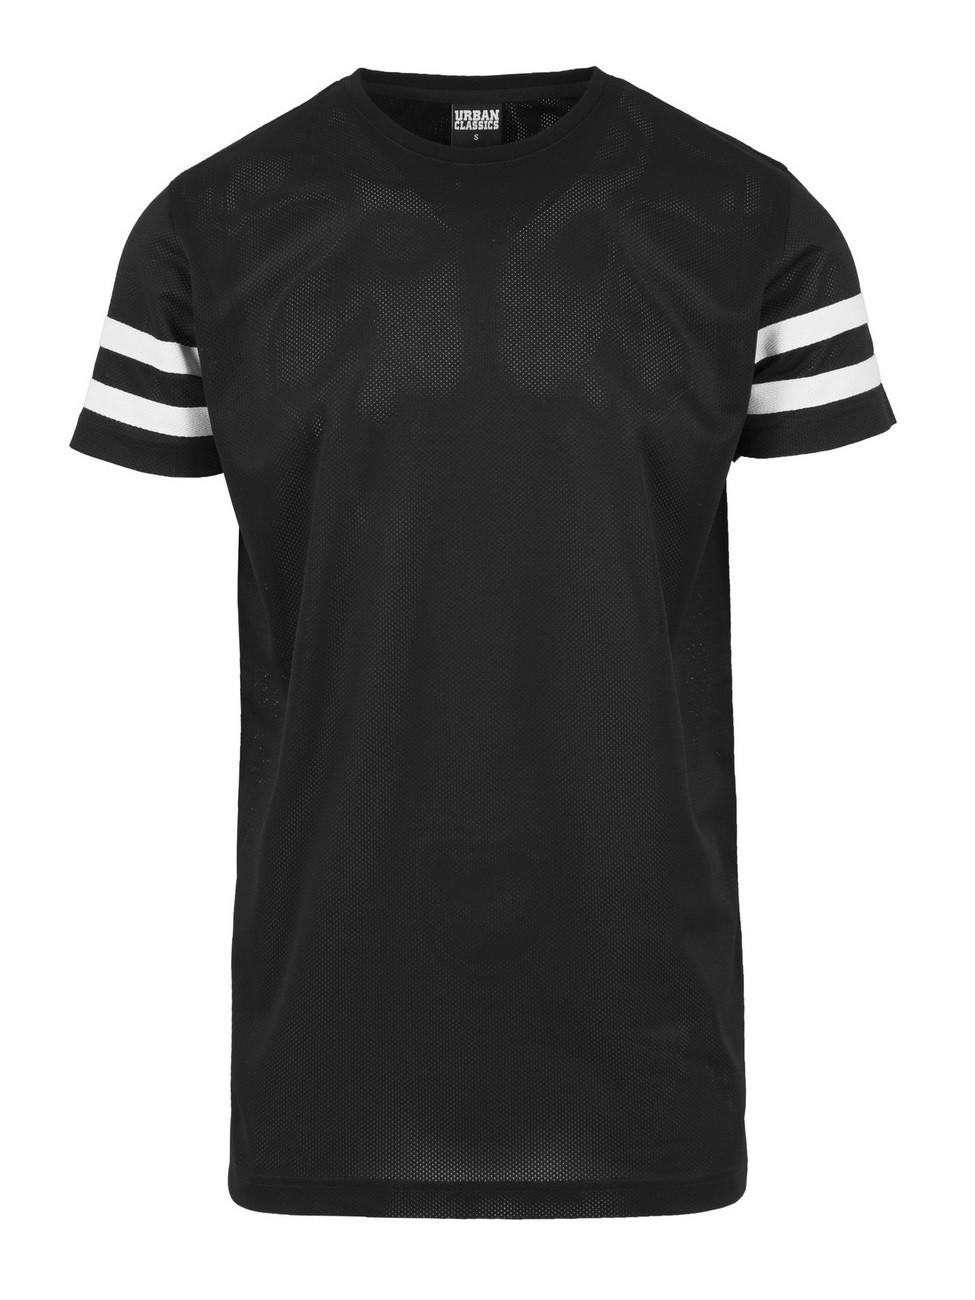 Urban Classics Herren Stripe Mesh T-Shirt S, Black-White (00050)